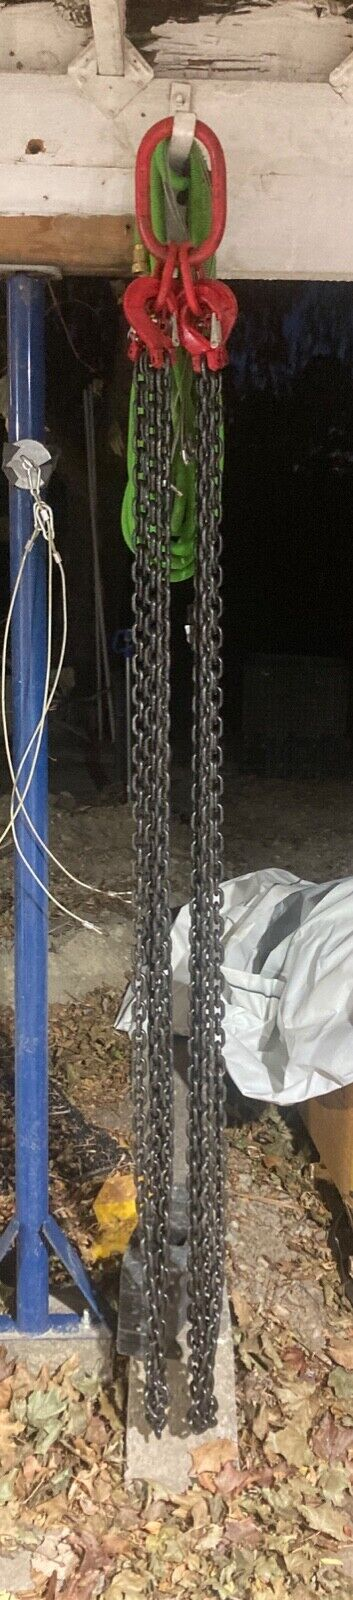 5/16 8mm G100 Chain Sling 12 Ft. 4-Leg Clevis Sling Hook W/Latch  - $222.00